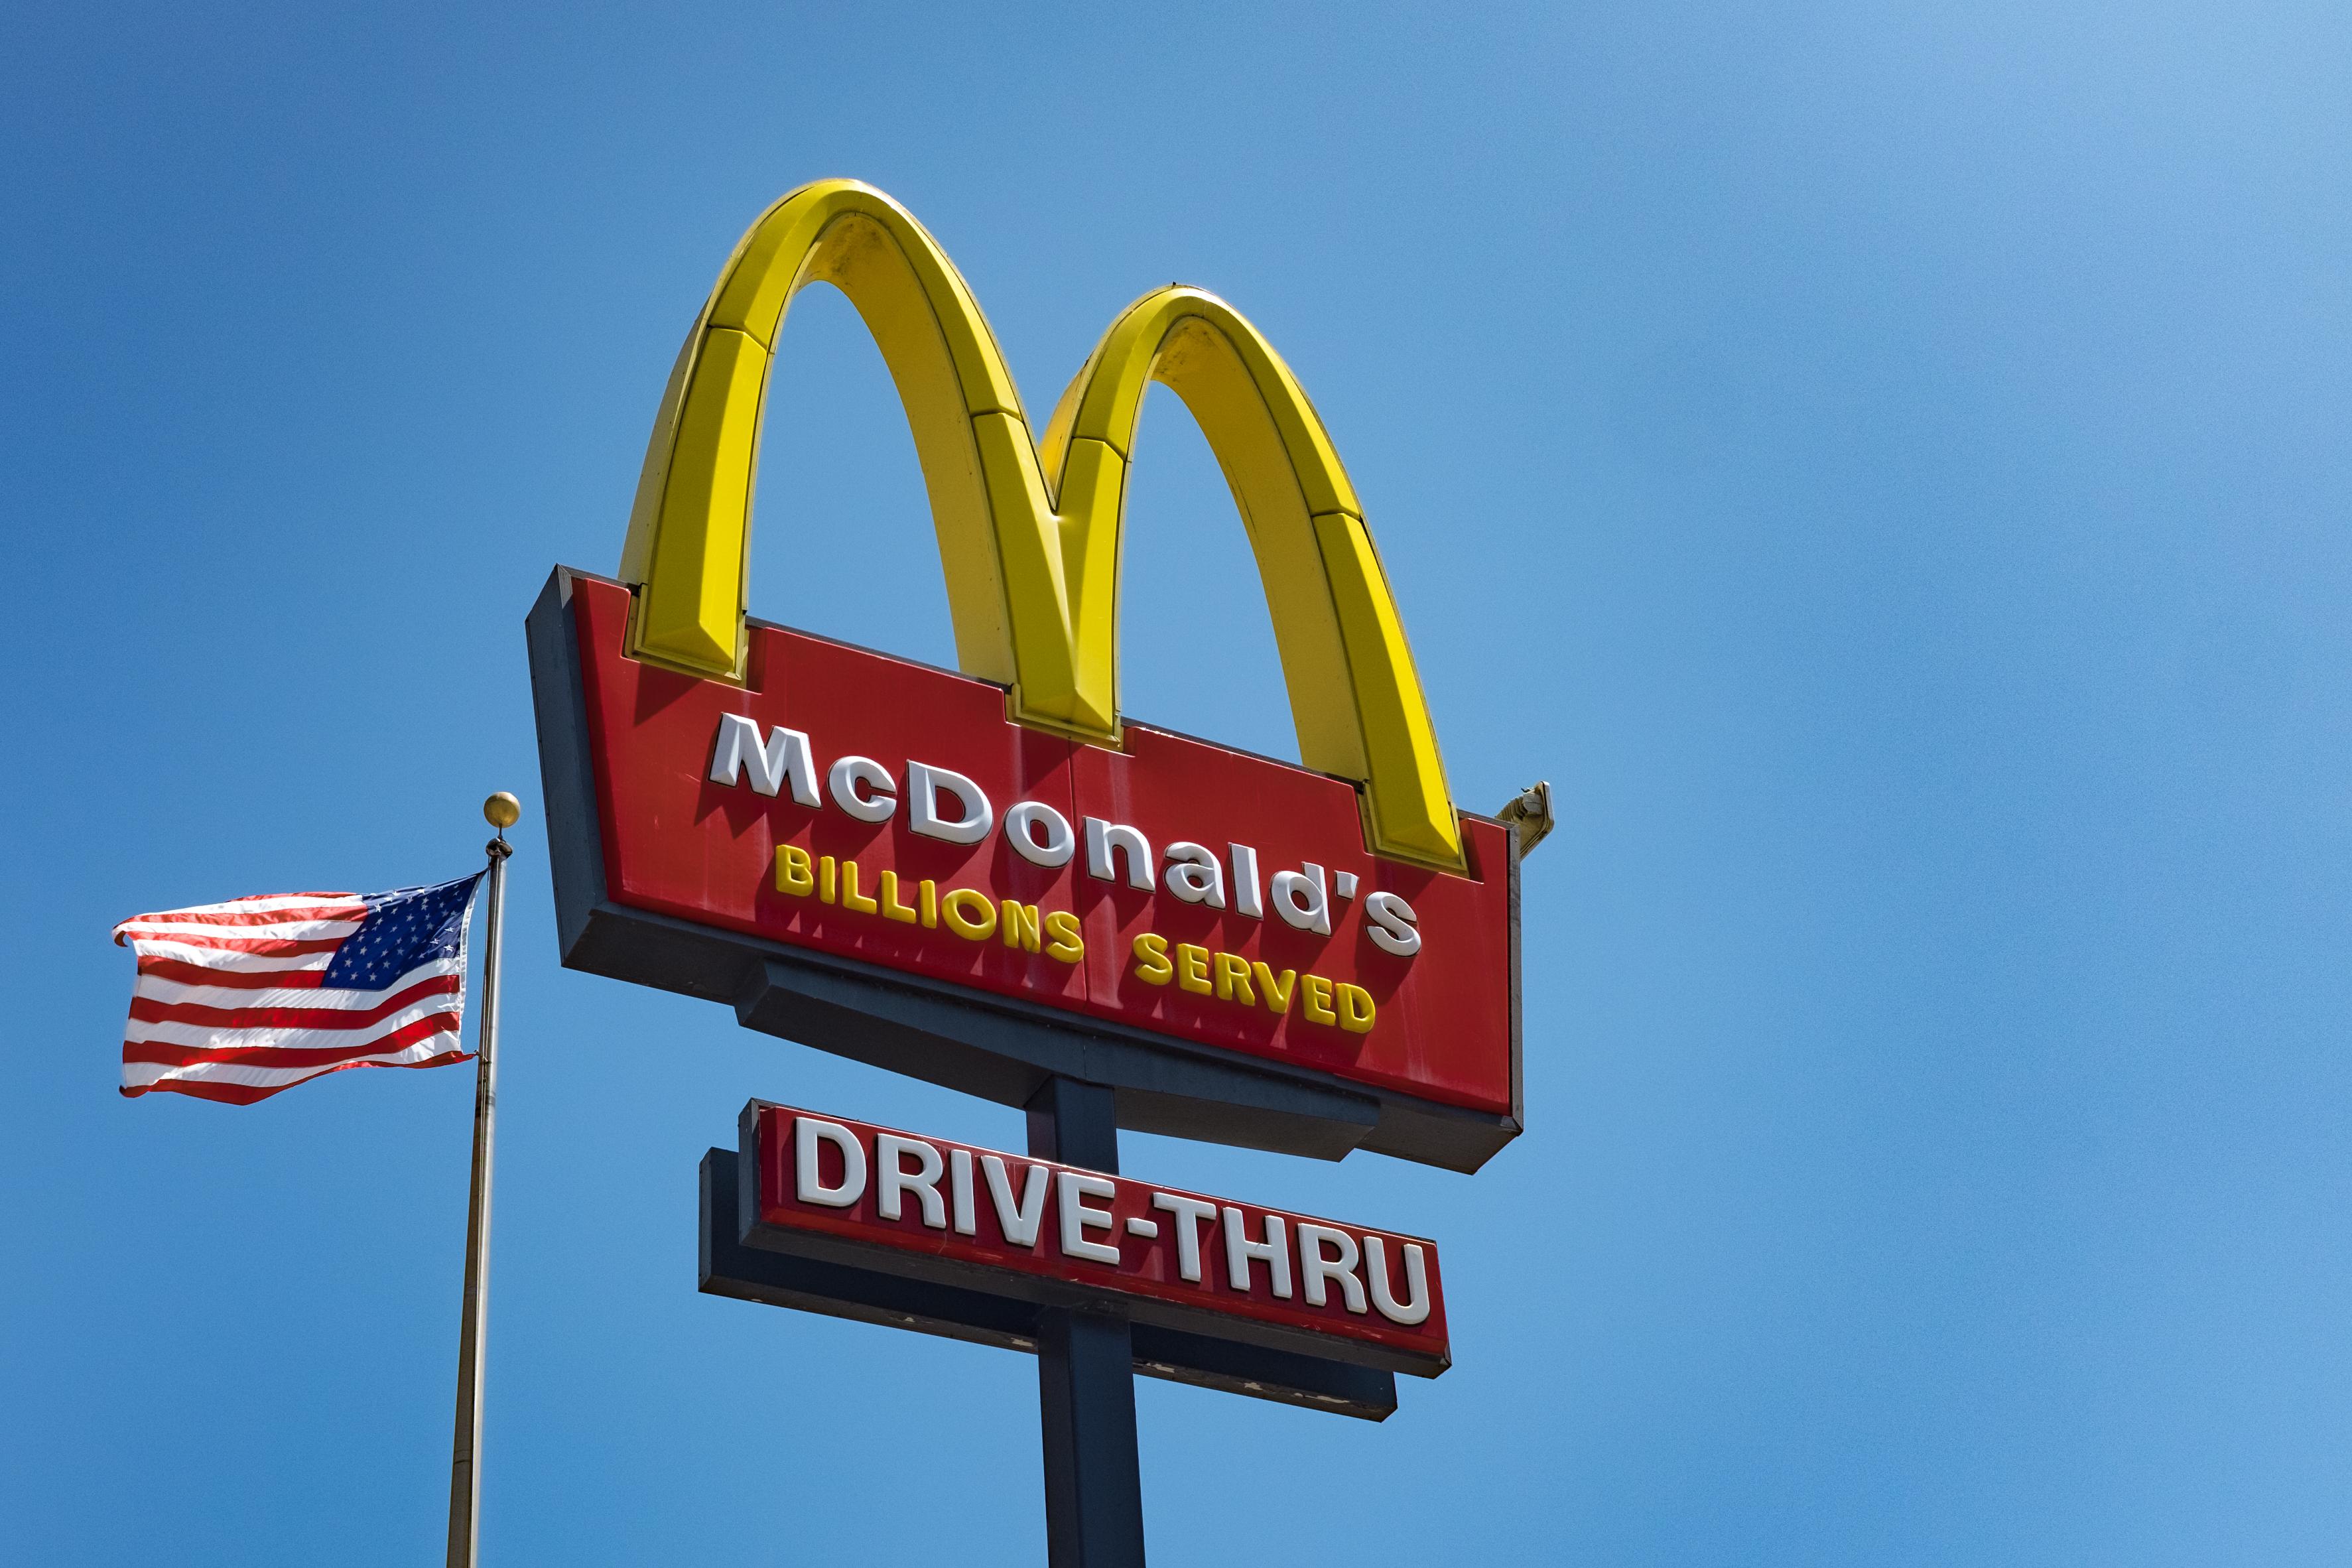 Woman found dead in McDonald's bathroom, investigation underway